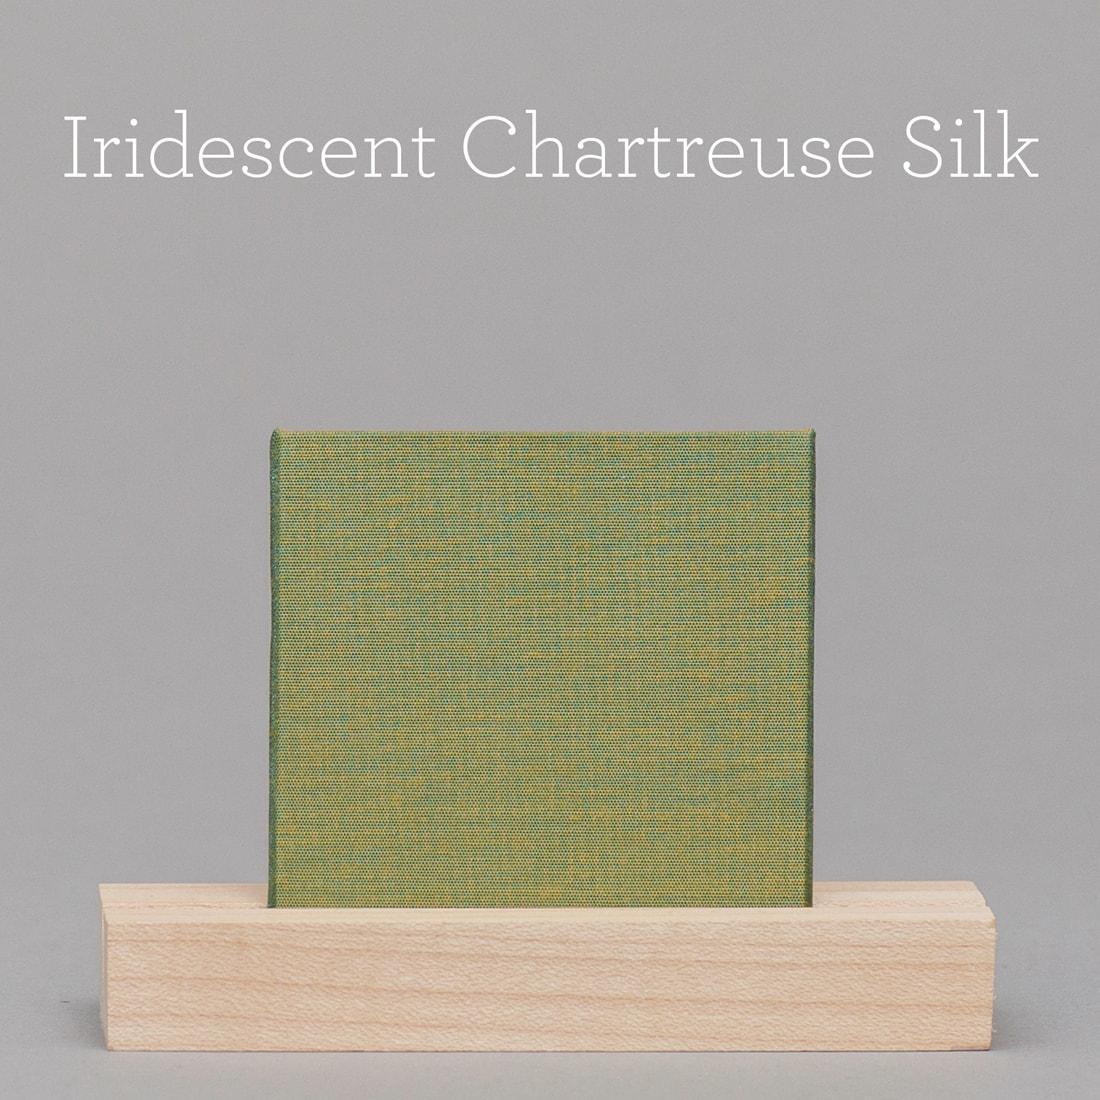 IridescentChartreuse